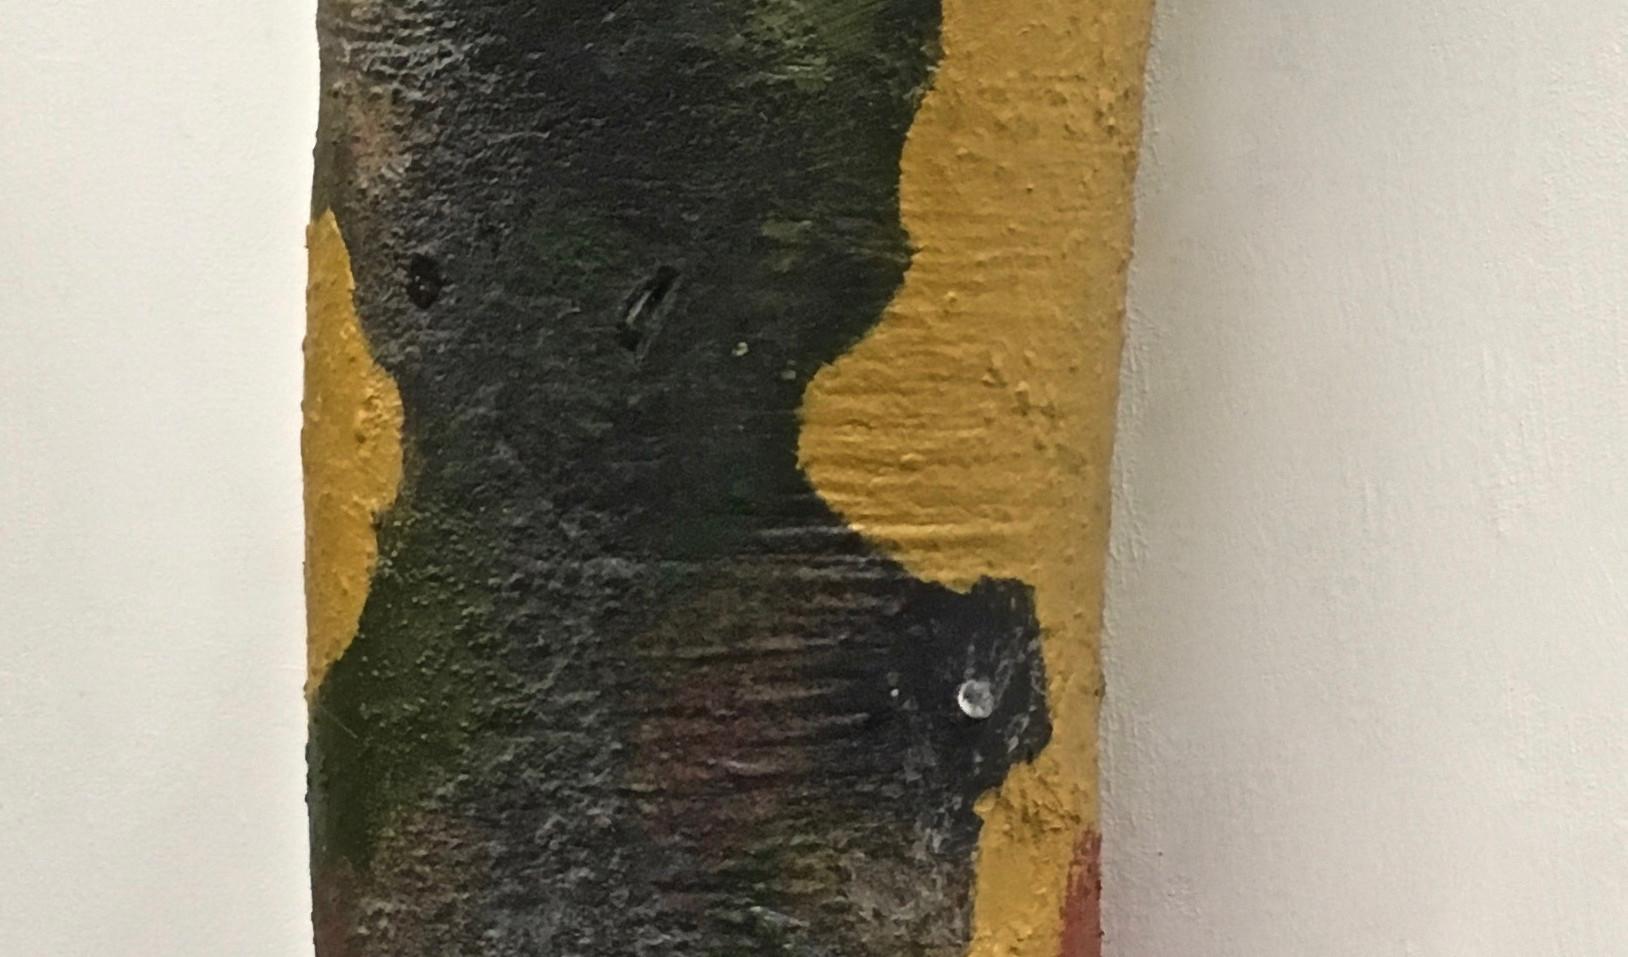 detail Trunk series no.4, 2019